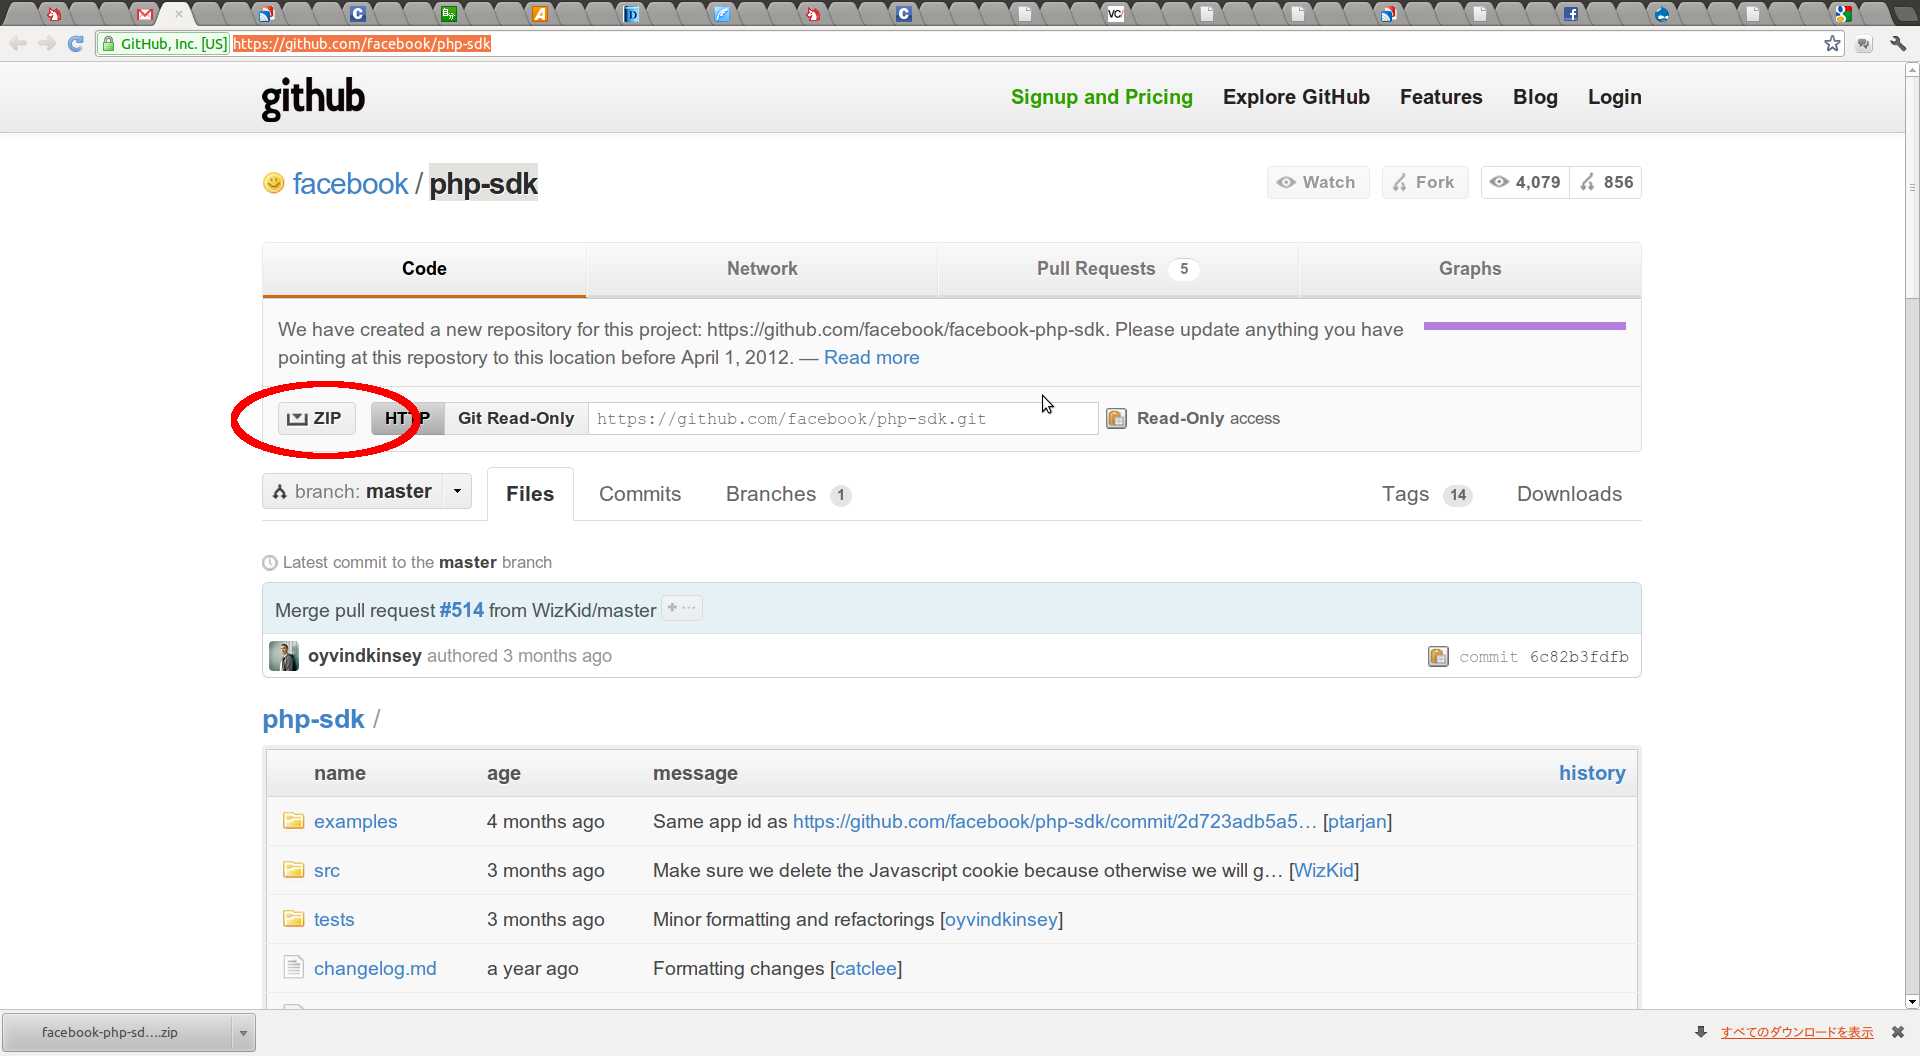 Screenshot-2012-05-03 07:46:15